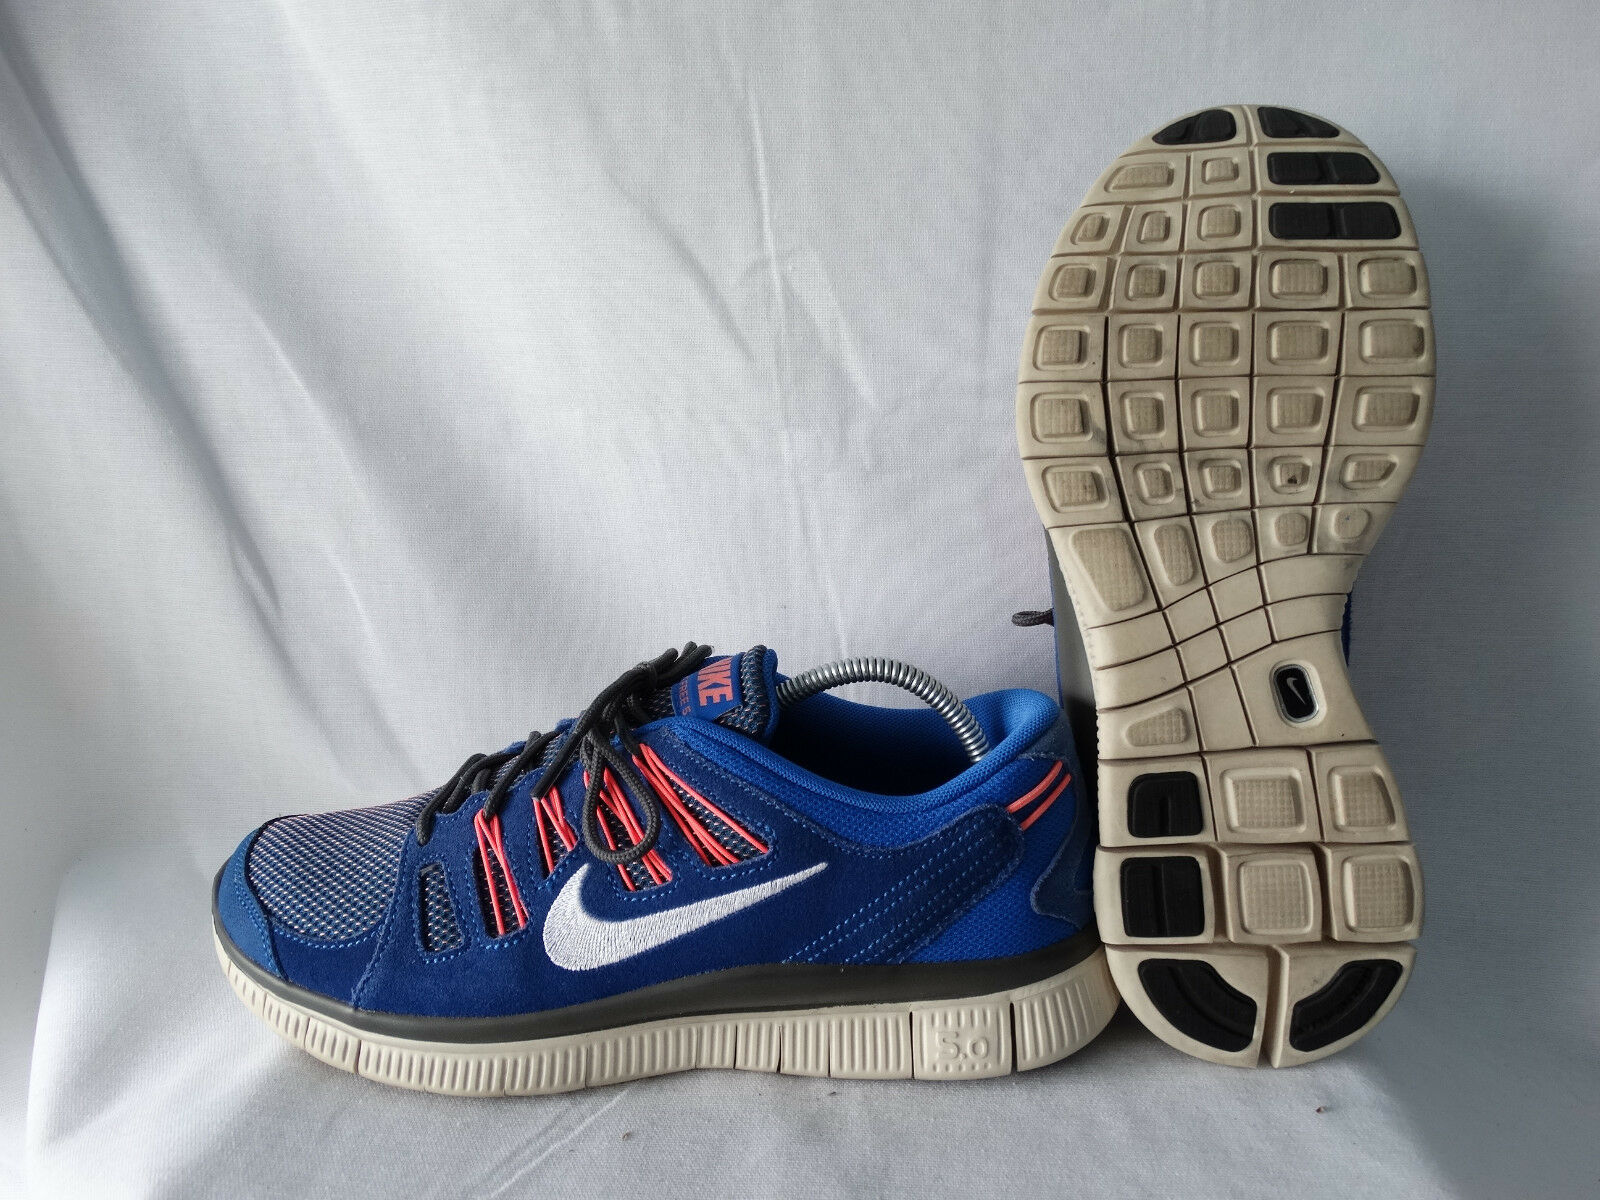 Nike Free 5.0 EXT Laufschuhe Runner 580530-414 blau-Orange-grau EU 40,5 US 7,5         Große Ausverkauf    Charmantes Design